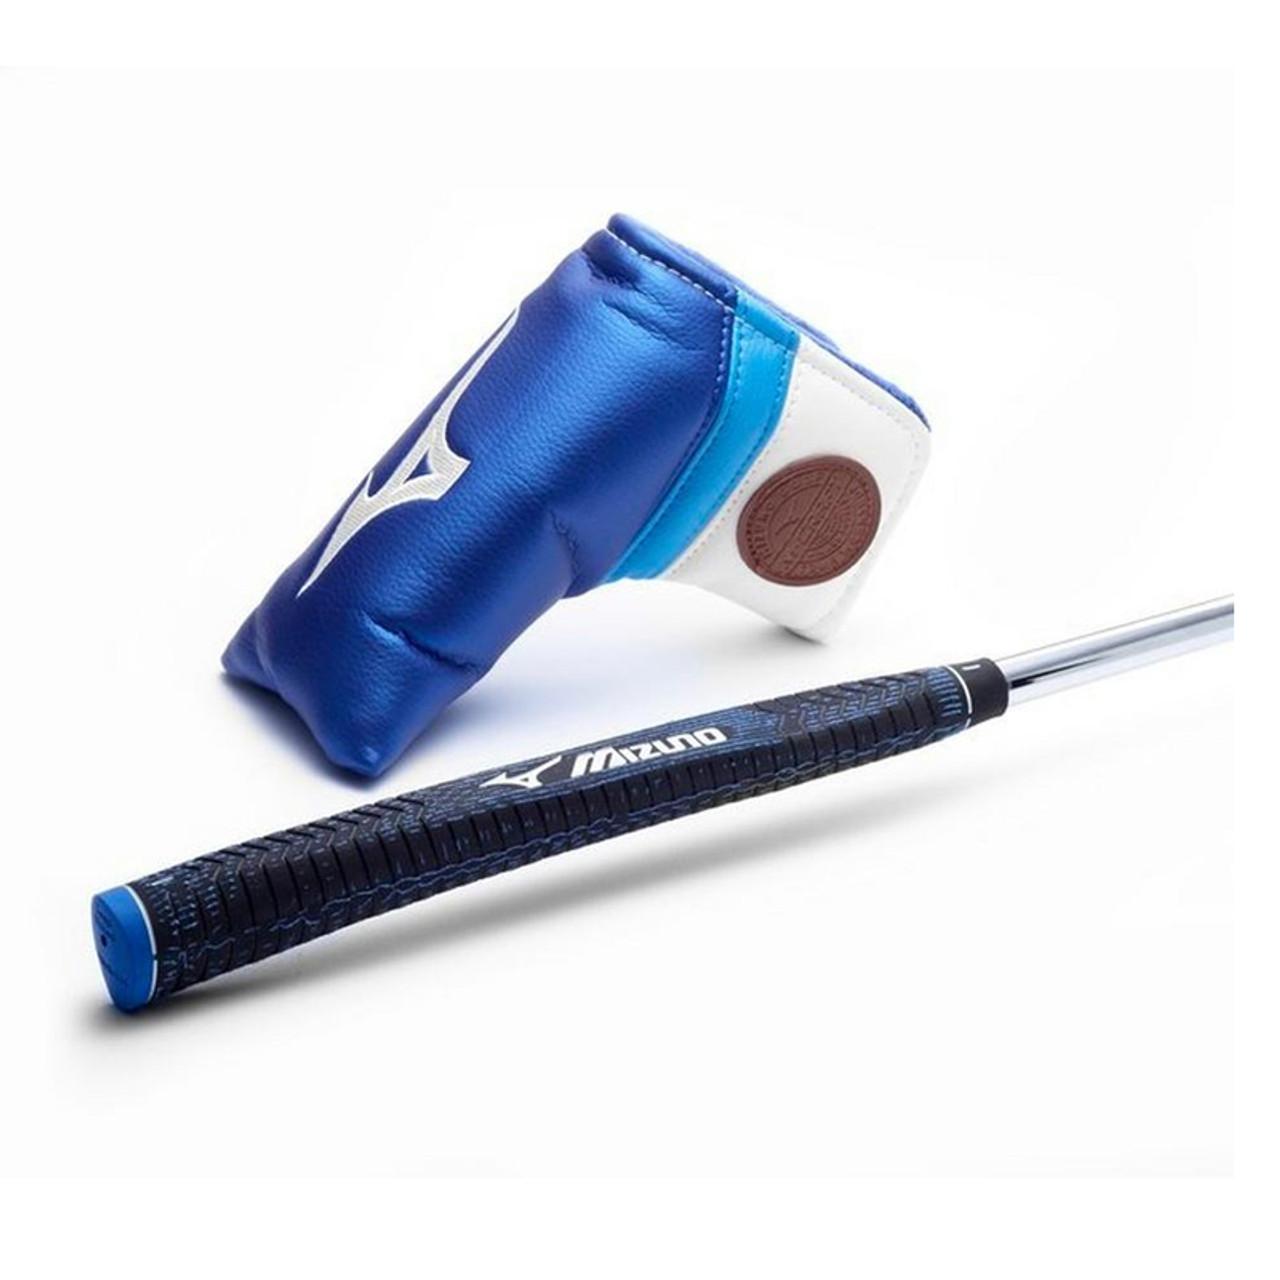 Mizuno M-Craft Type I Blue Ion Putter